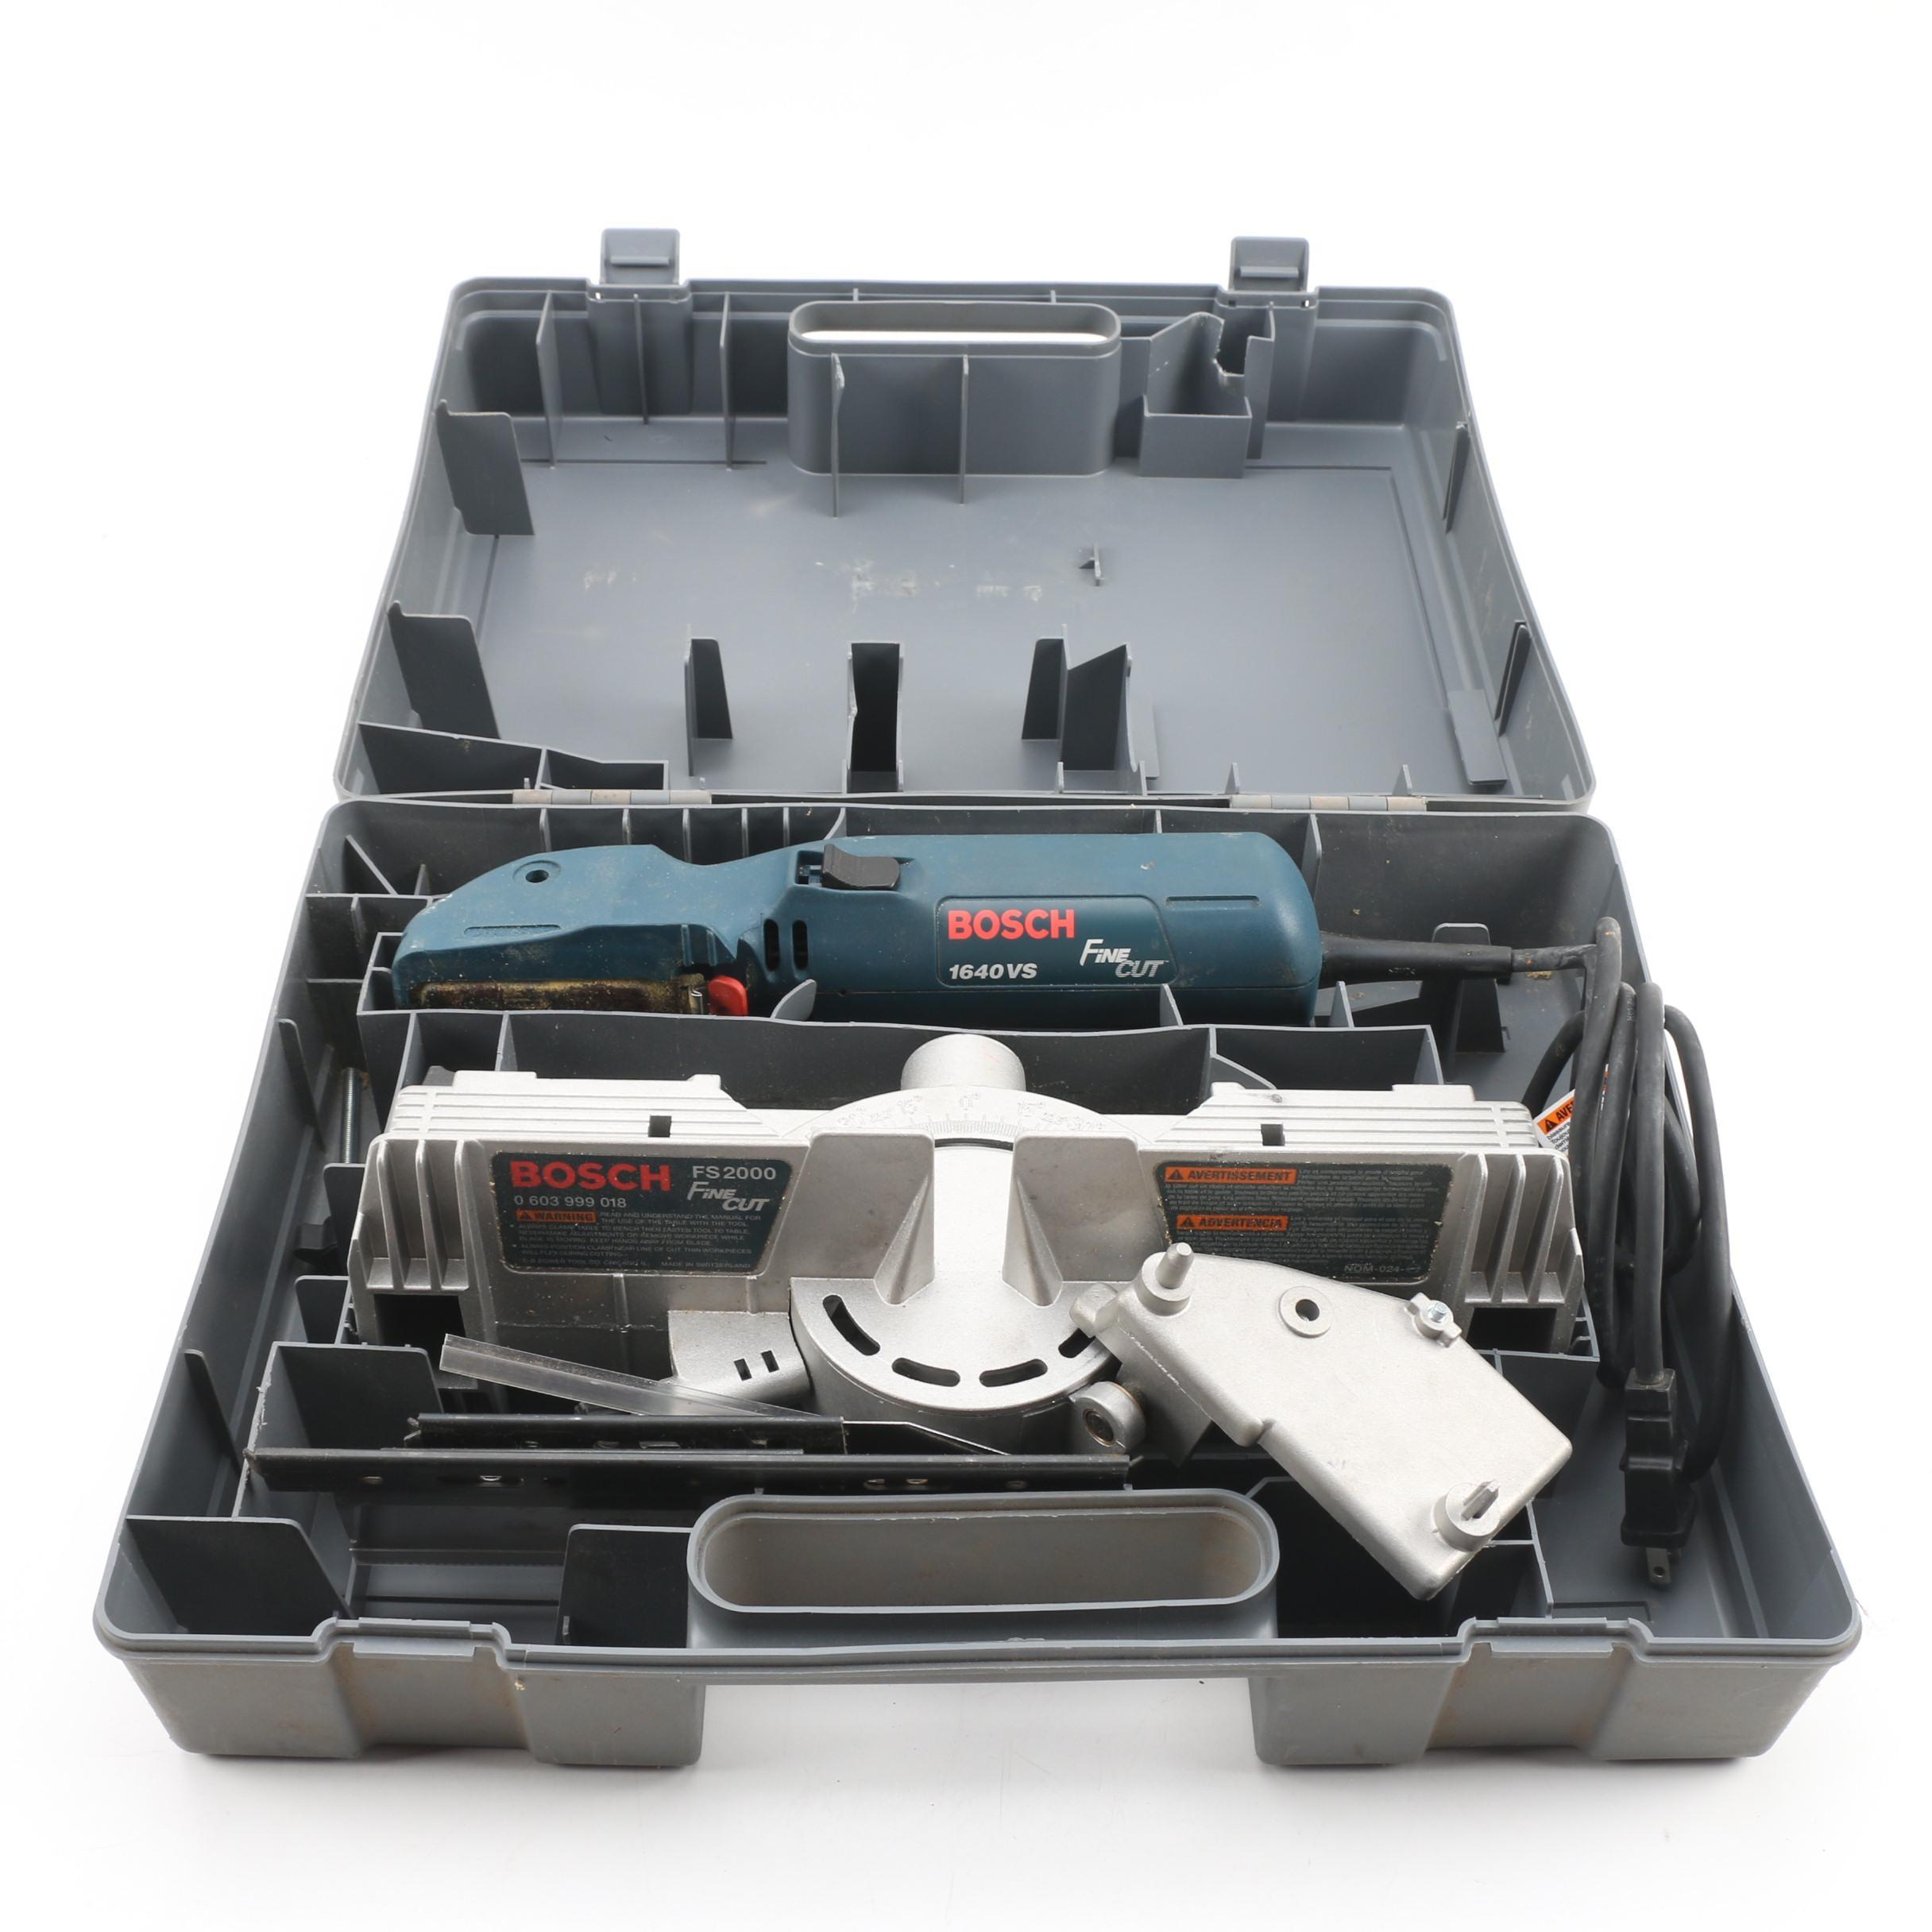 Bosch 1640VS Finecut Power Handsaw